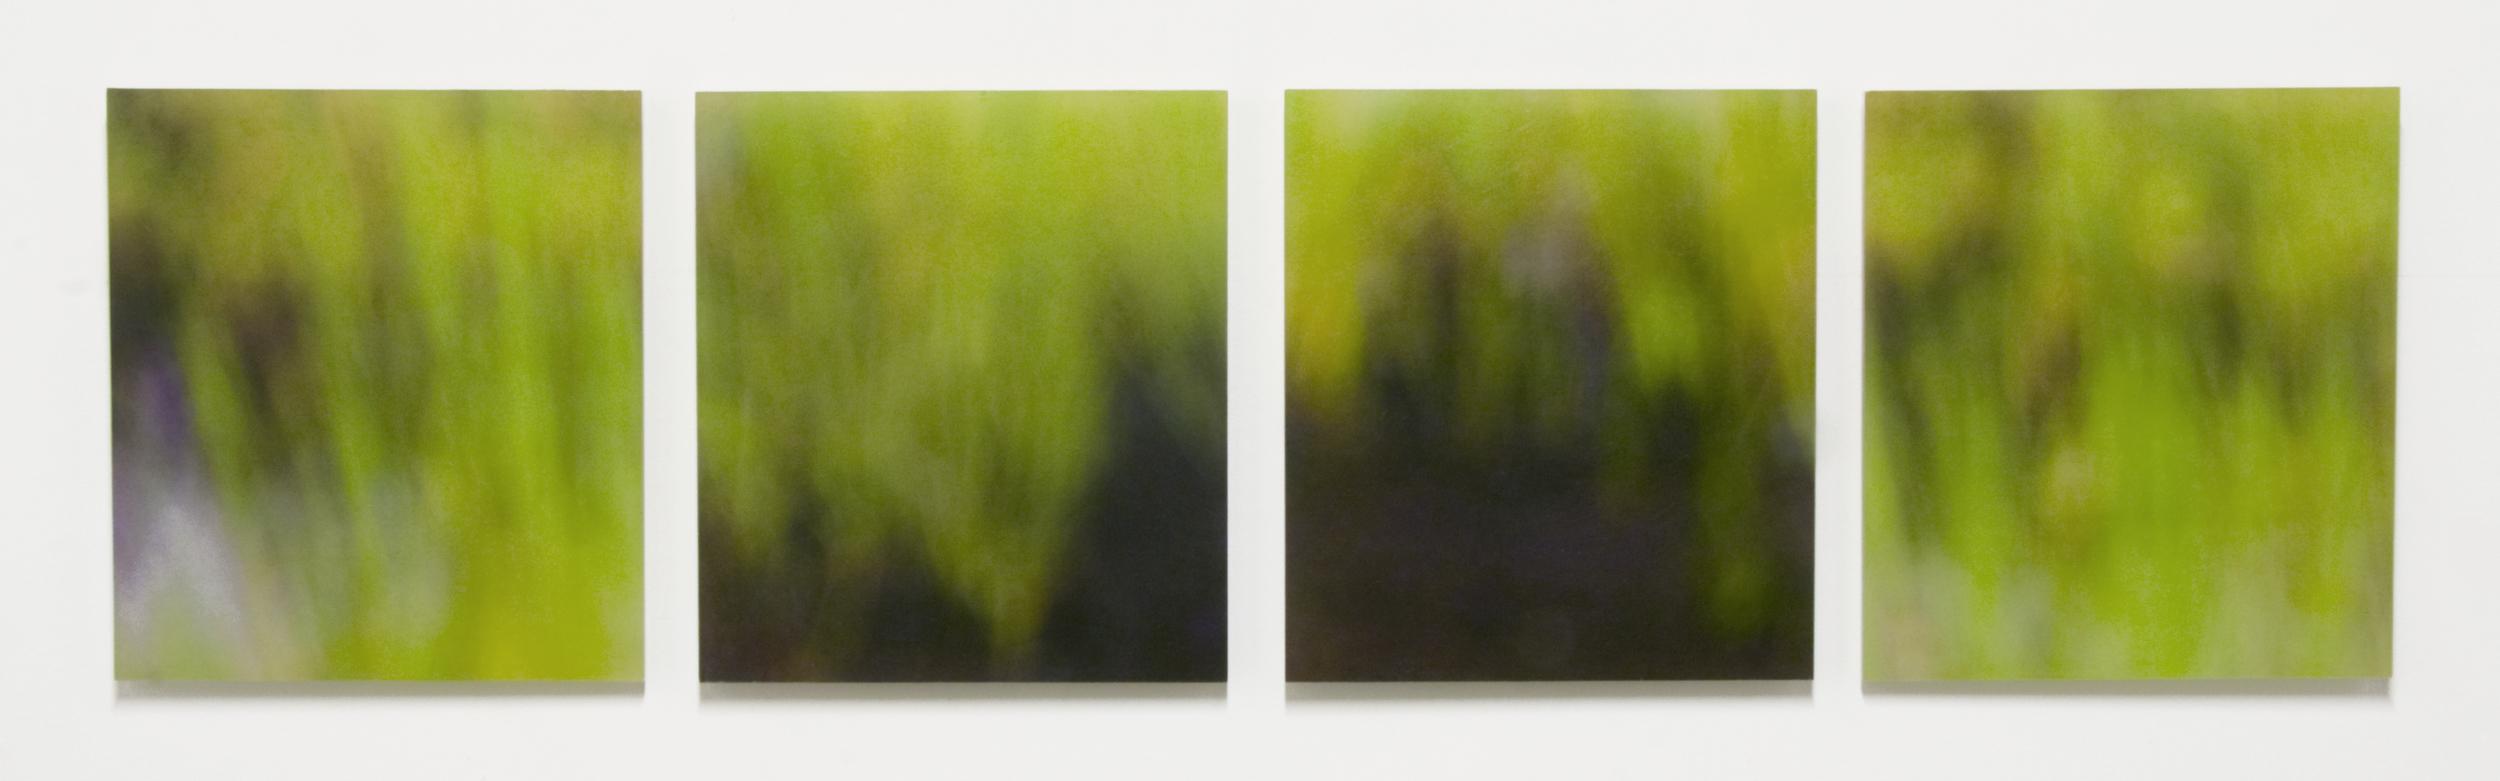 "Marsh Grass, No.3,  11"" x 43"", Pigment Ink on Japanese Kozo on Sanded Acrylic Panel"